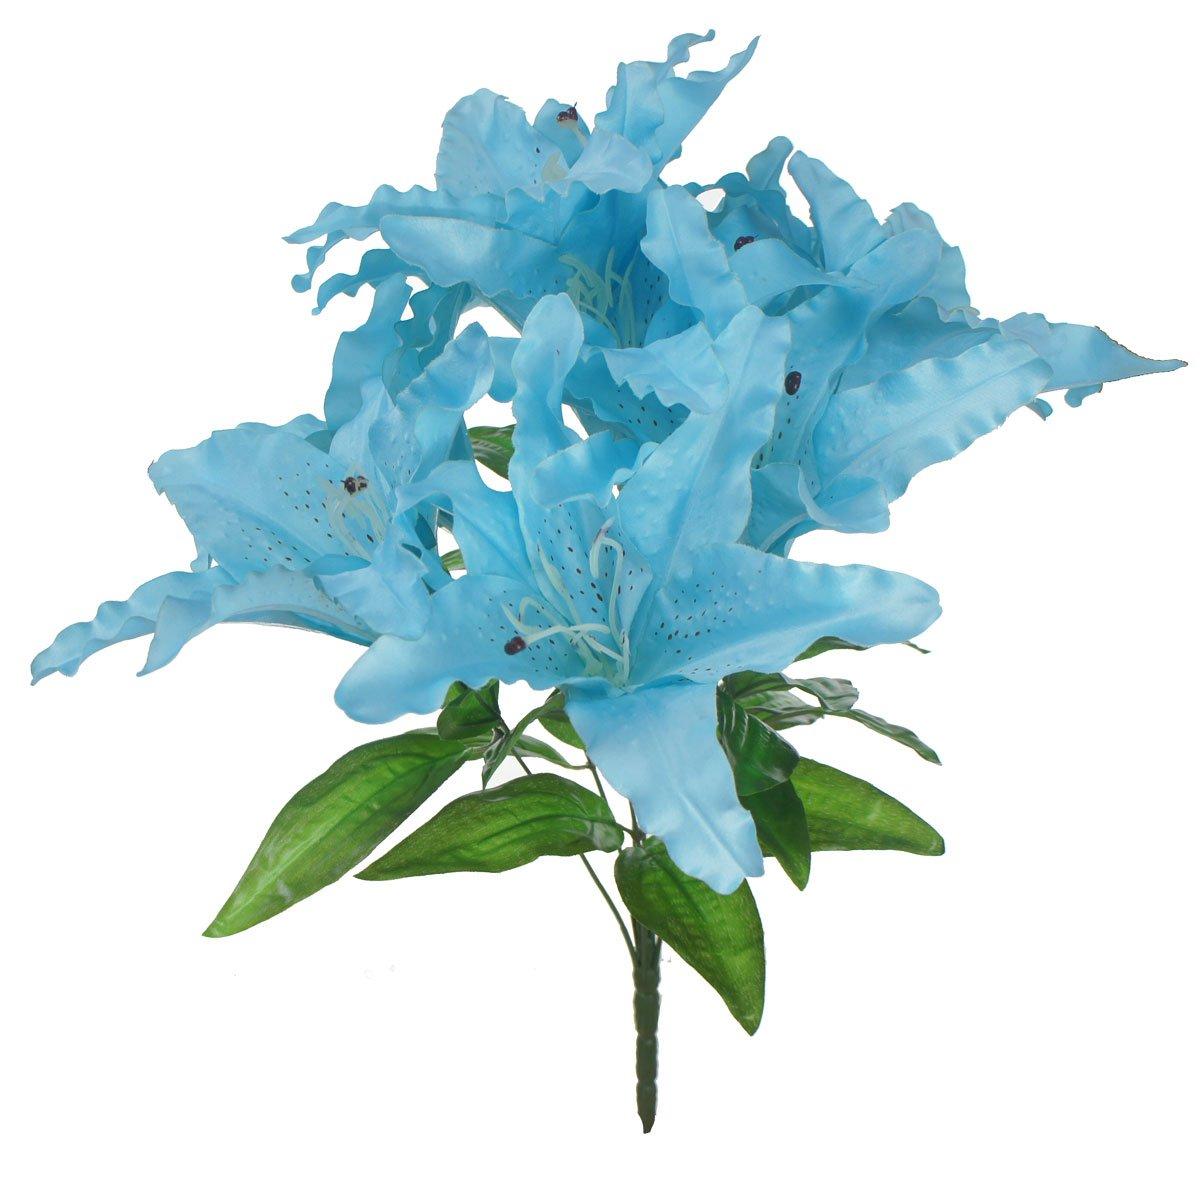 Amazon.com: Lily Garden Large Tiger Lily 9-head Silk Flowers Bush ...